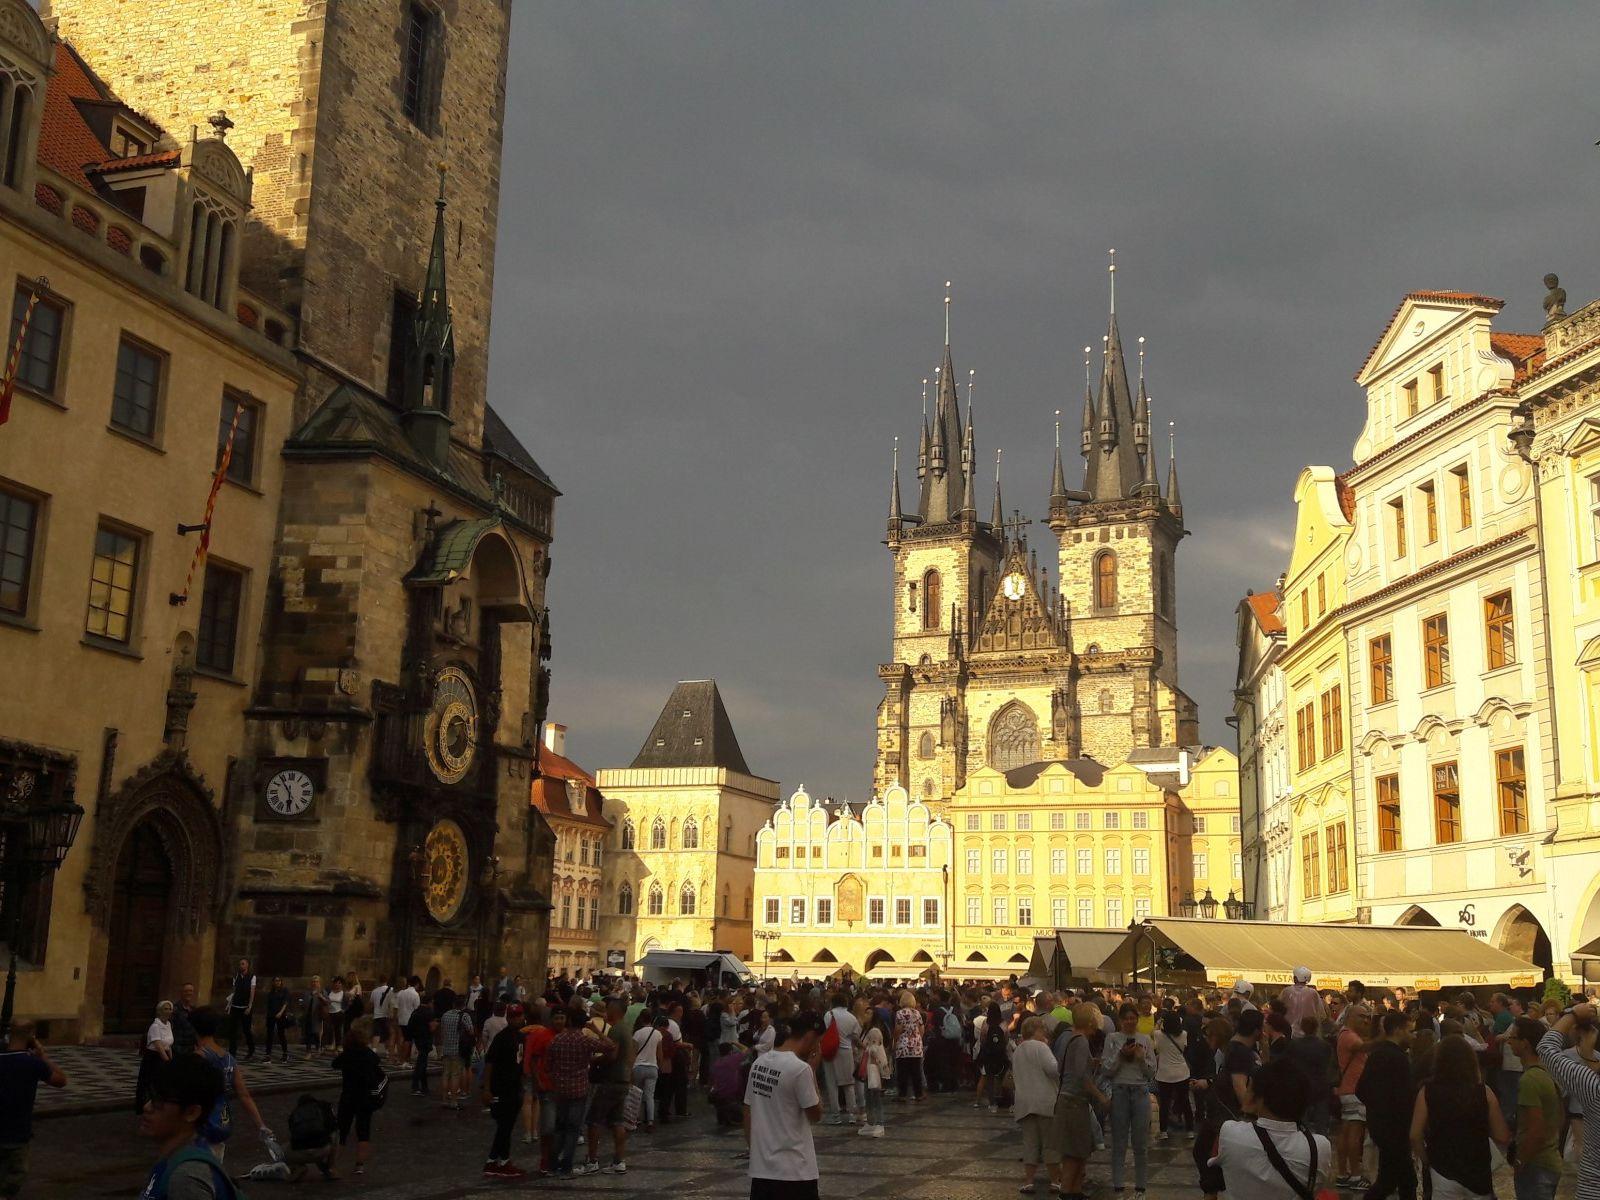 Putovanje Cannafest Prag 2019. - Rasprodano!: PRAG: Obilazak uz vodiča